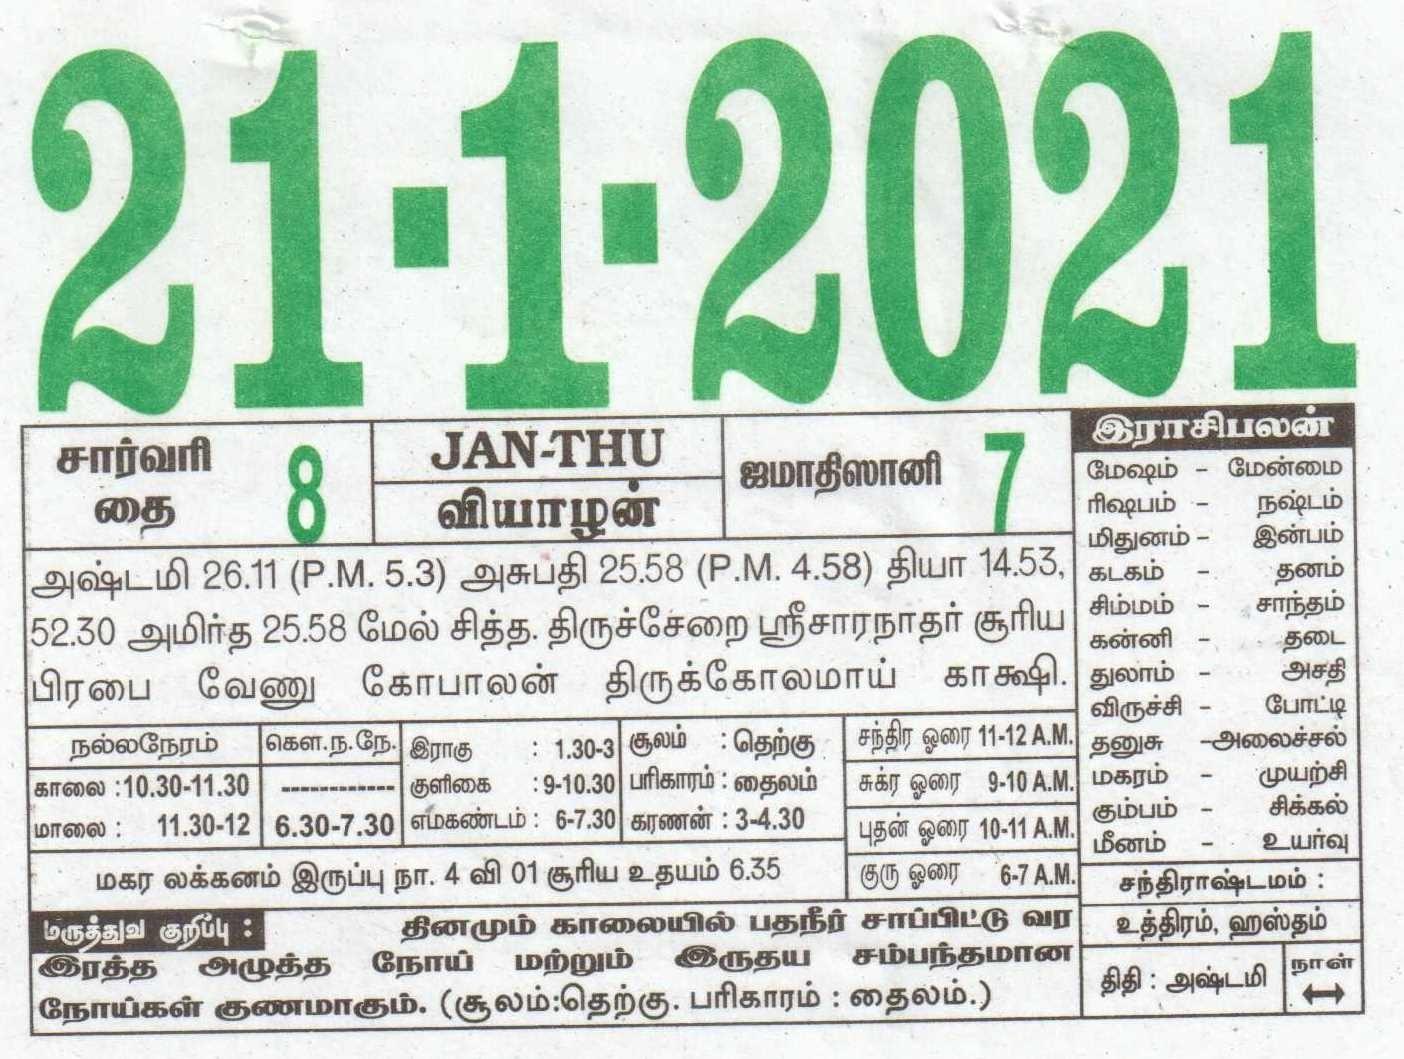 21-01-2021 Daily Calendar | Date 21 , January Daily Tear Off Calendar | Daily Panchangam Rasi Palan August 2021 Tamil Daily Calendar